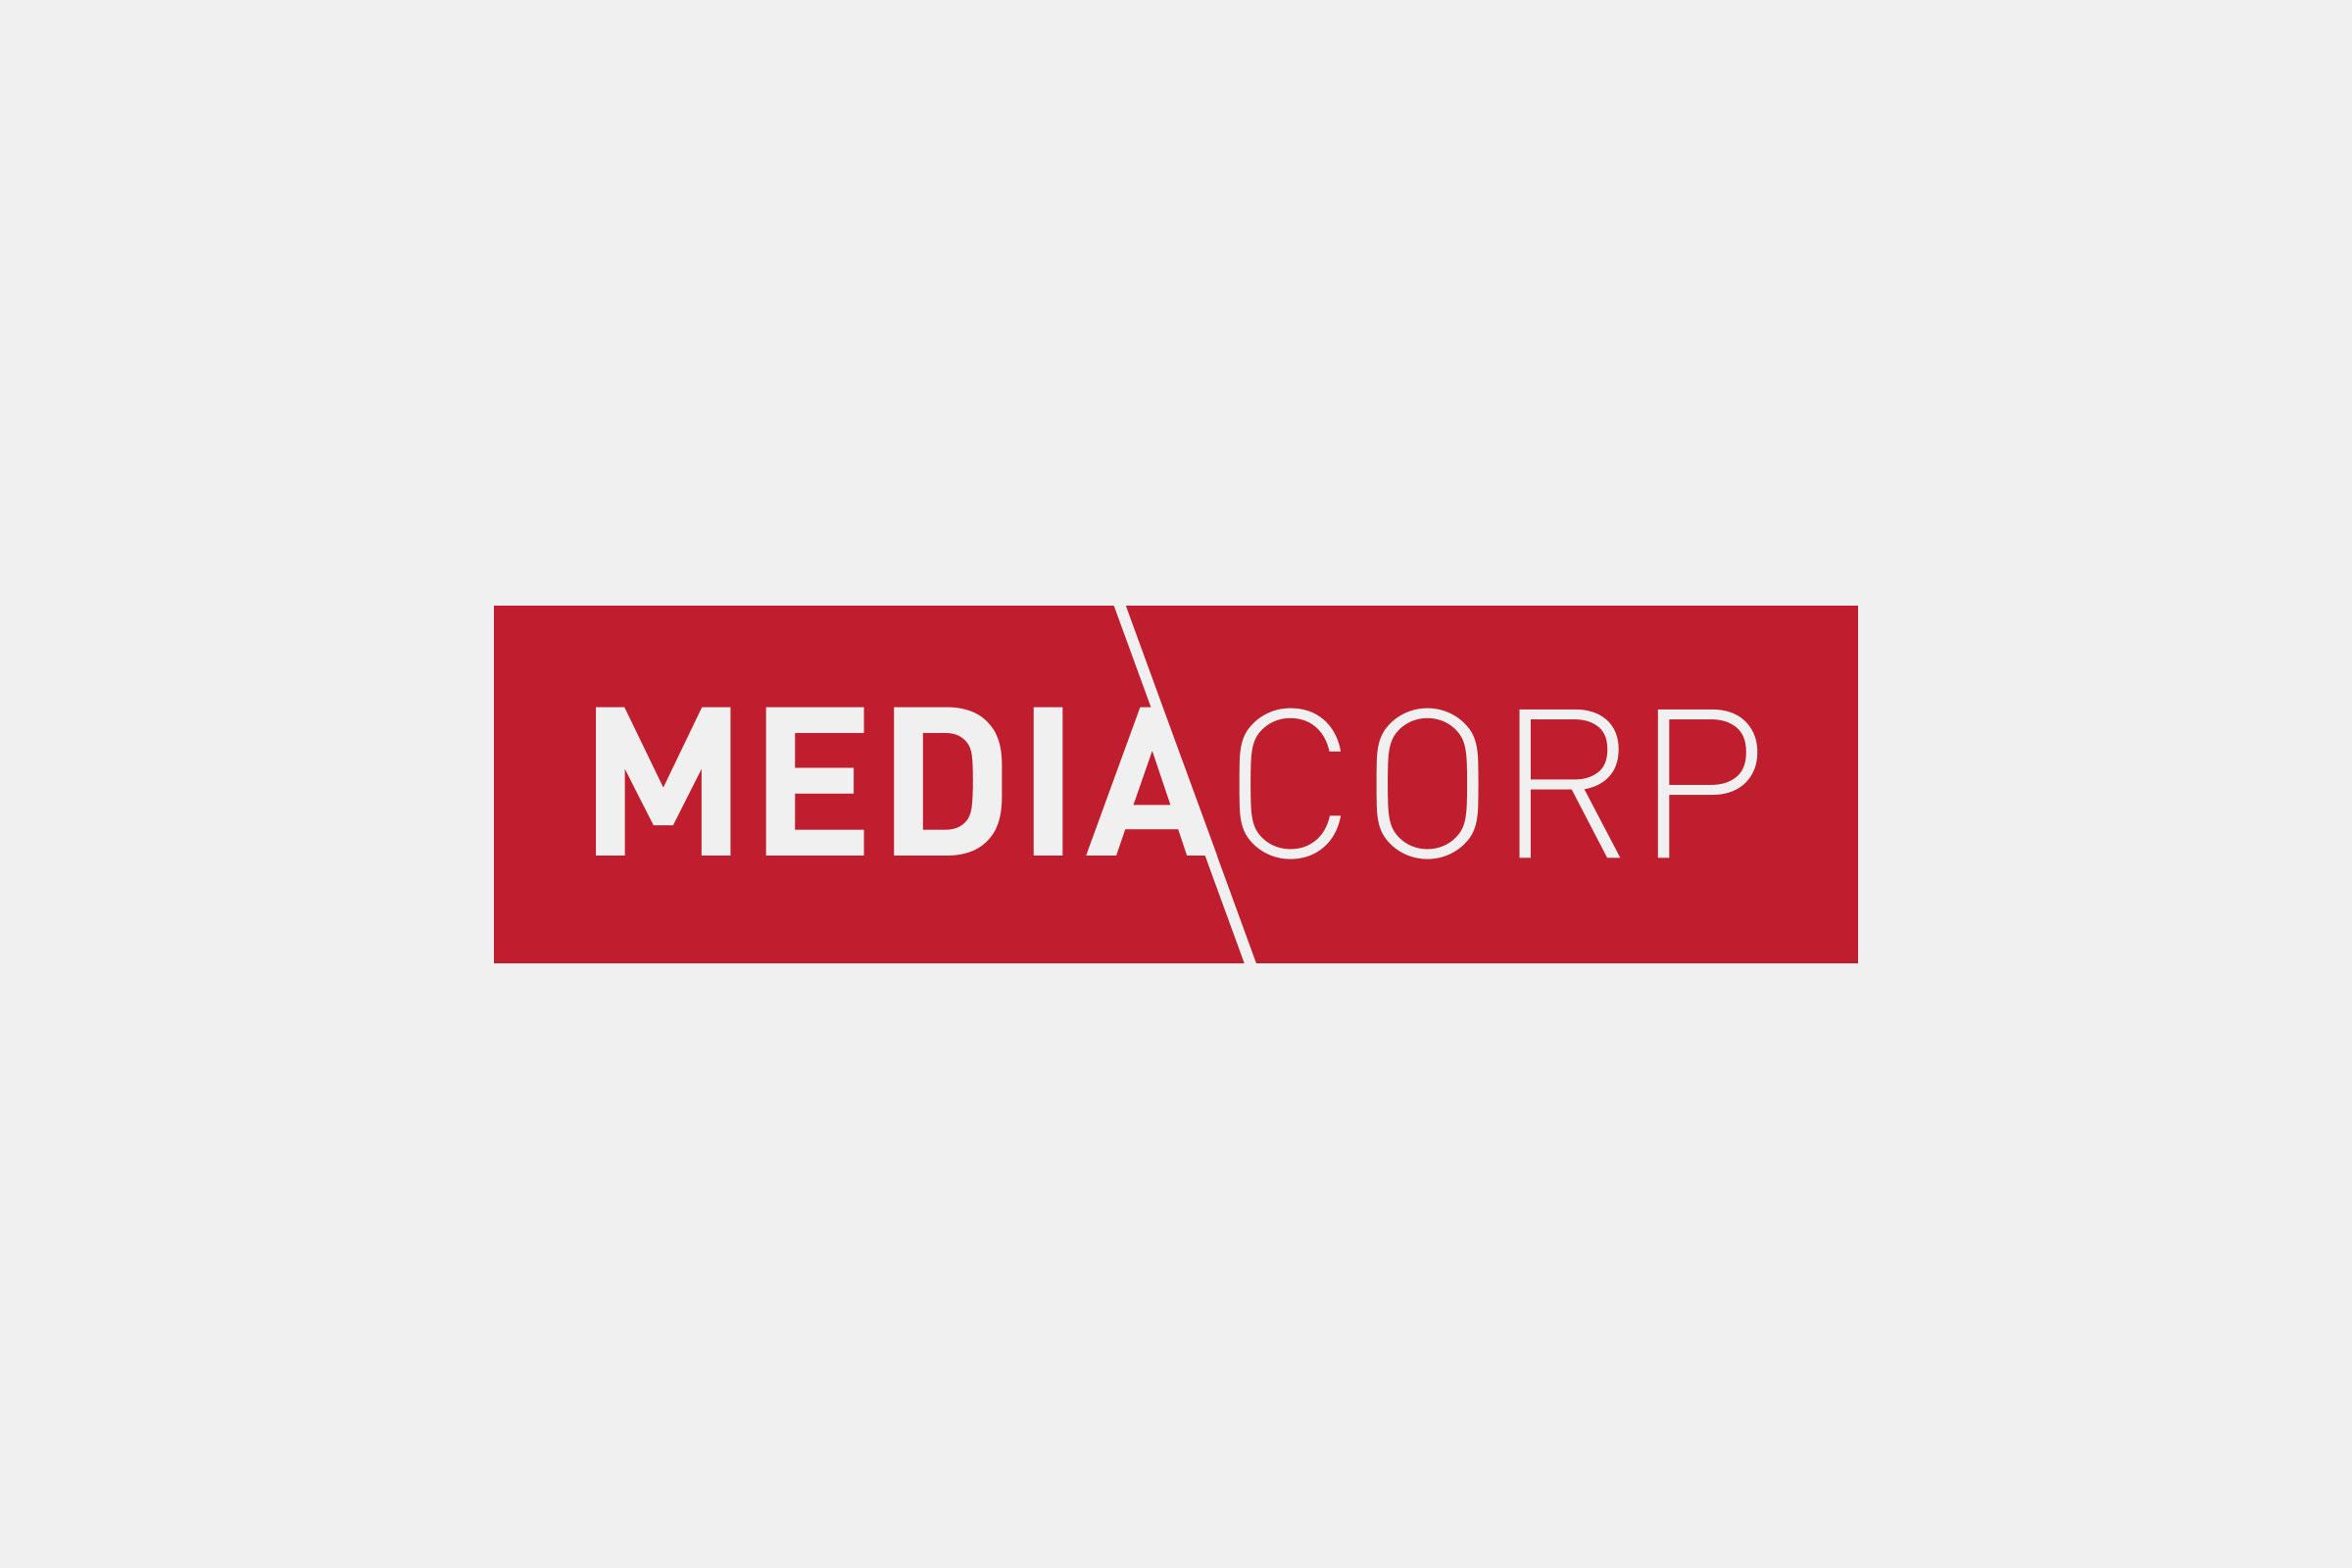 mediacorp - logo